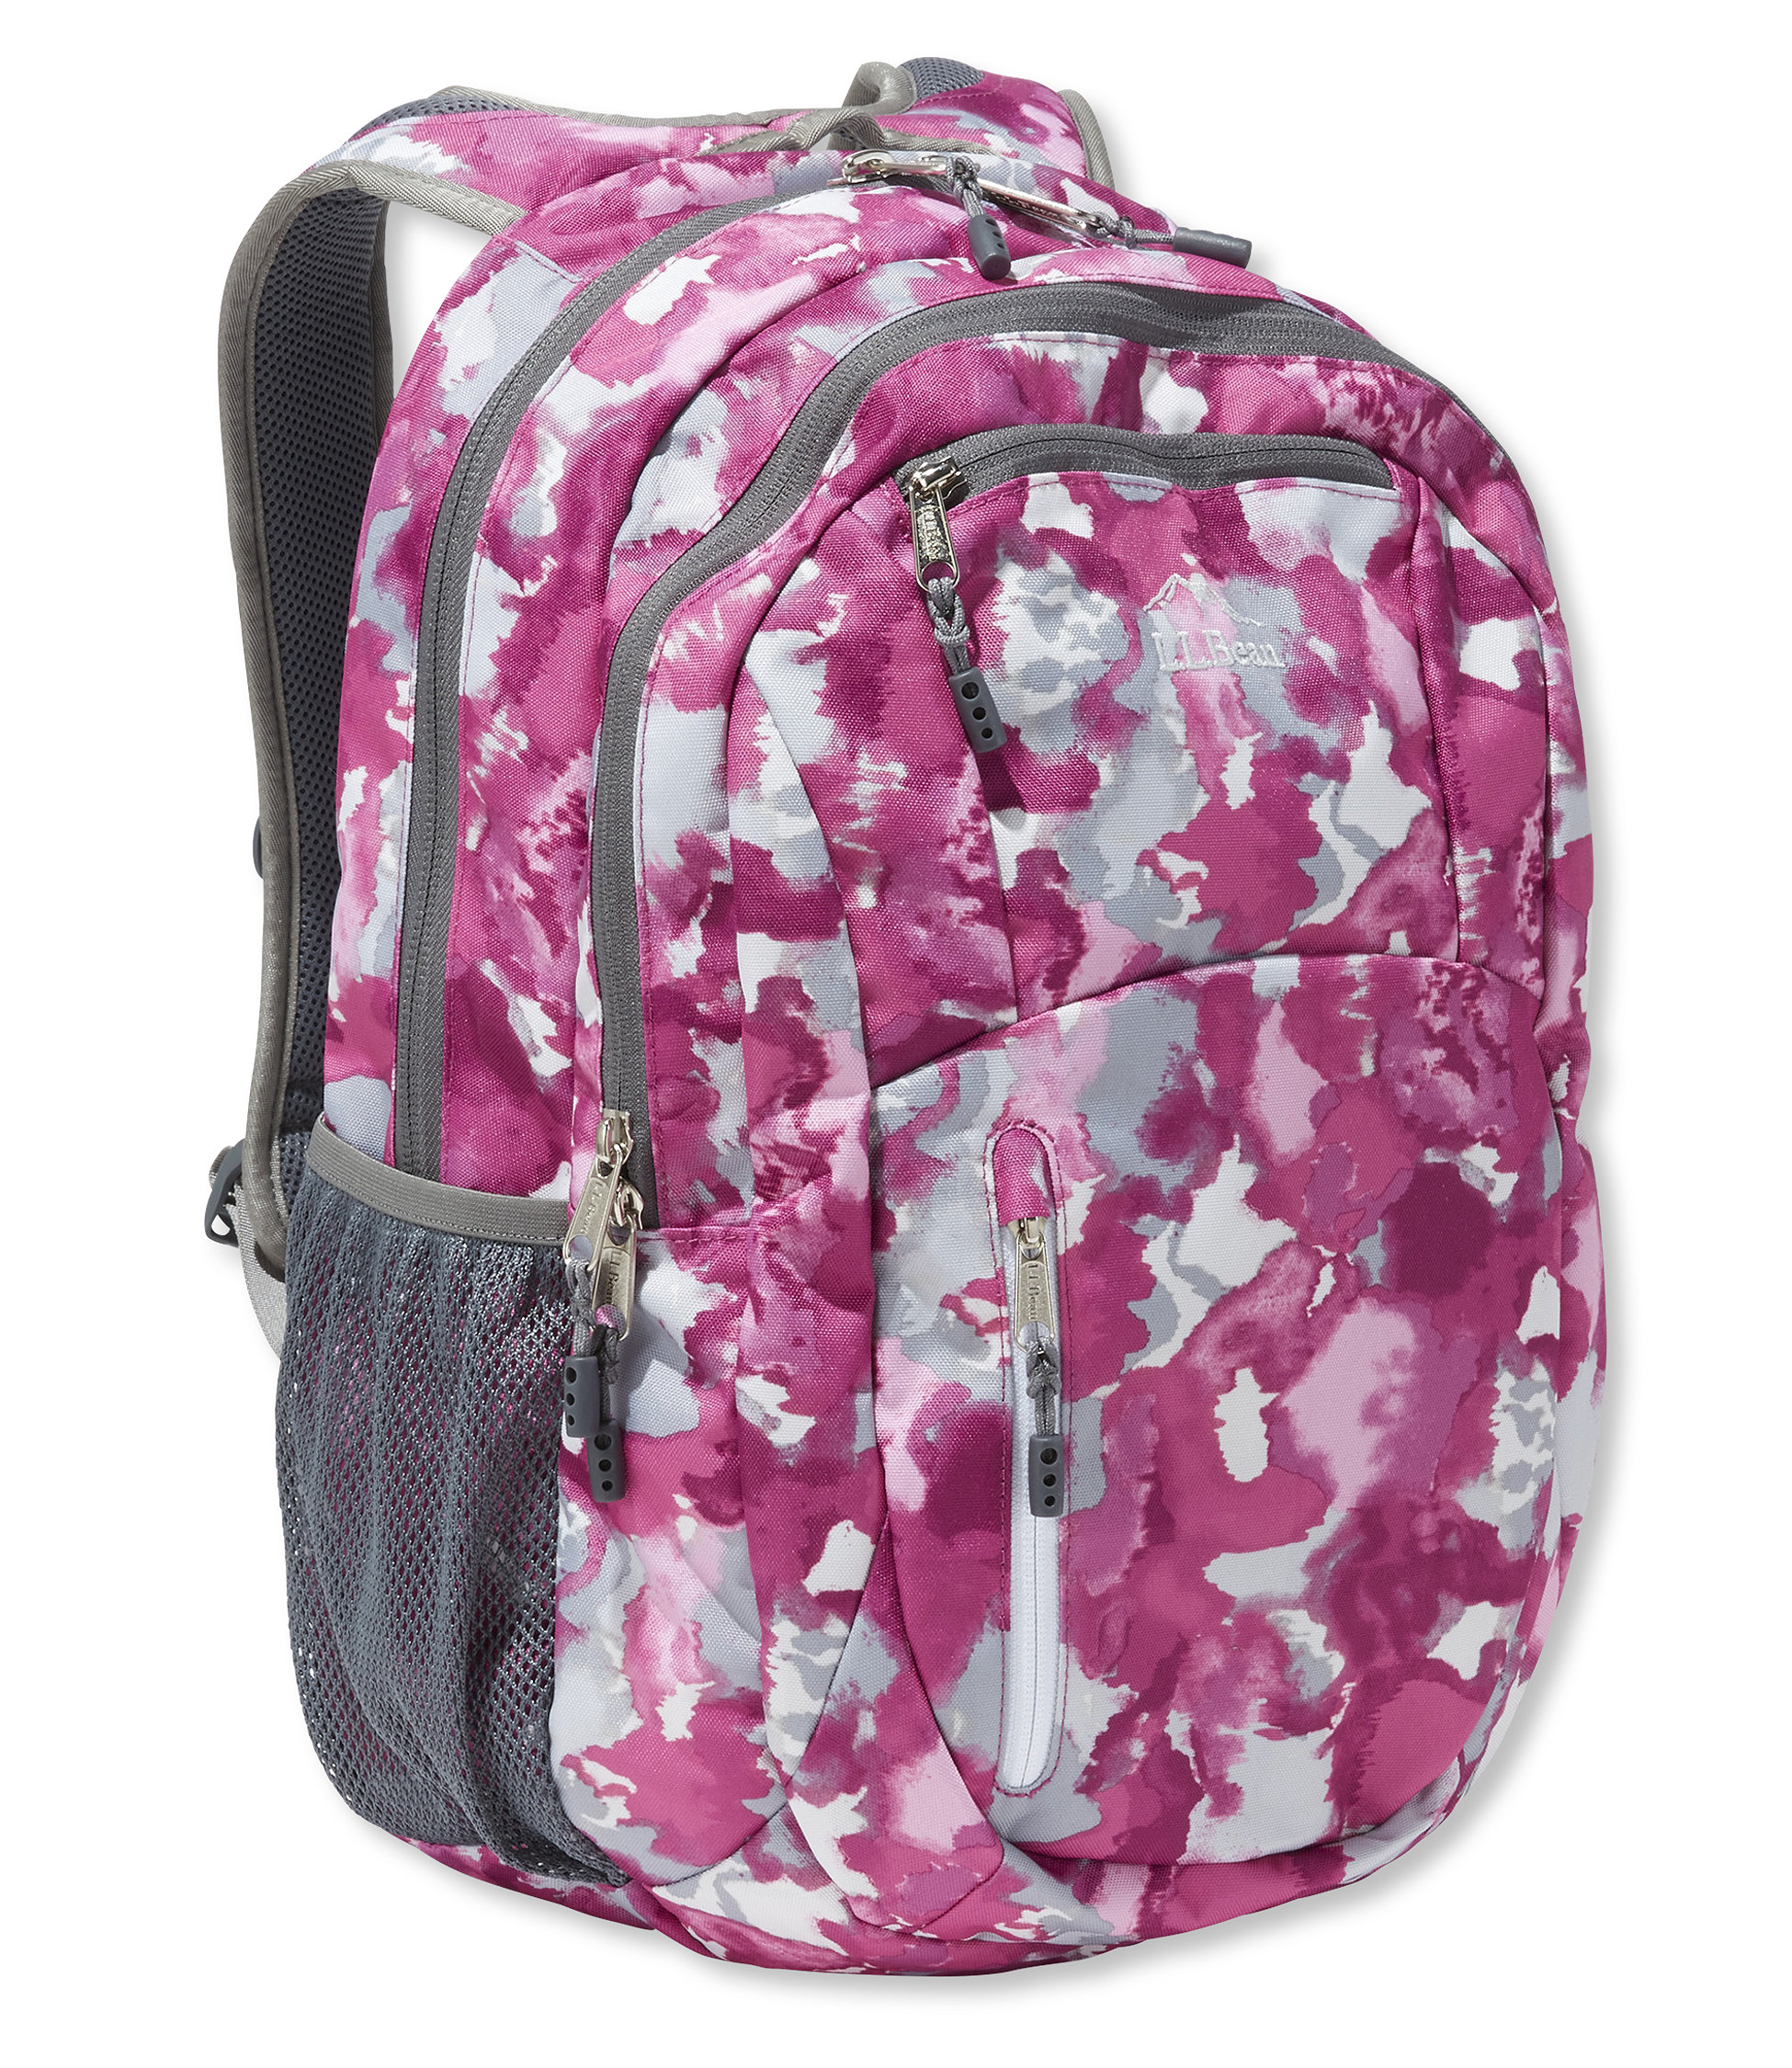 L.L.Bean Ledge Backpack